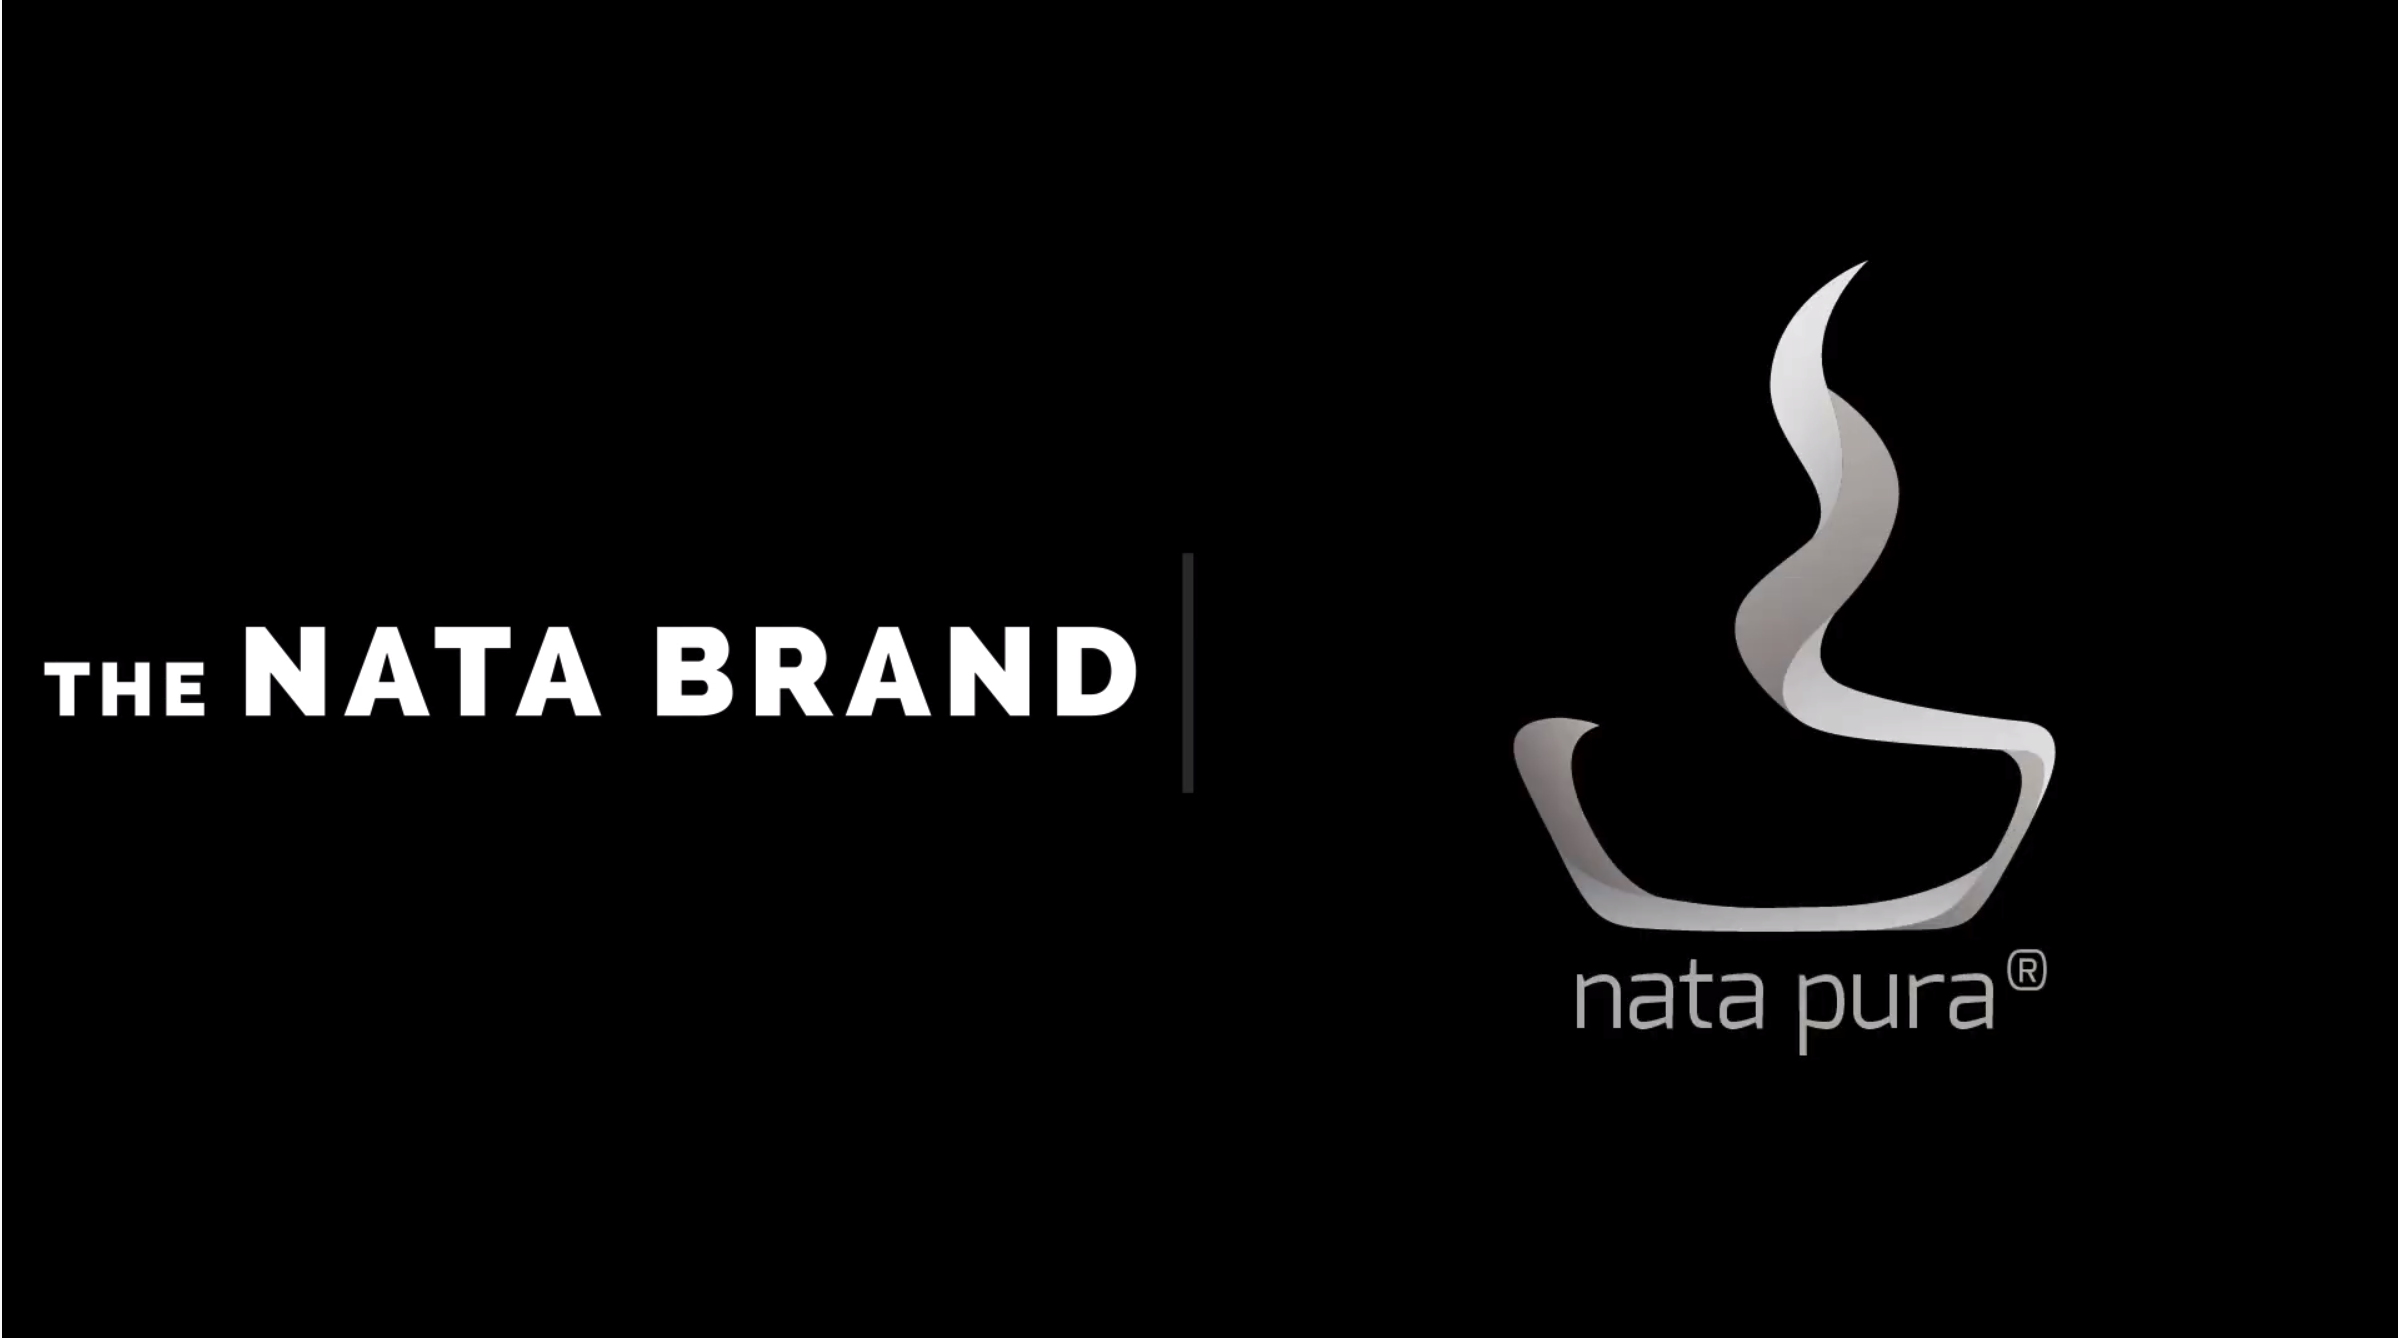 The Nata Brand embracing copycats